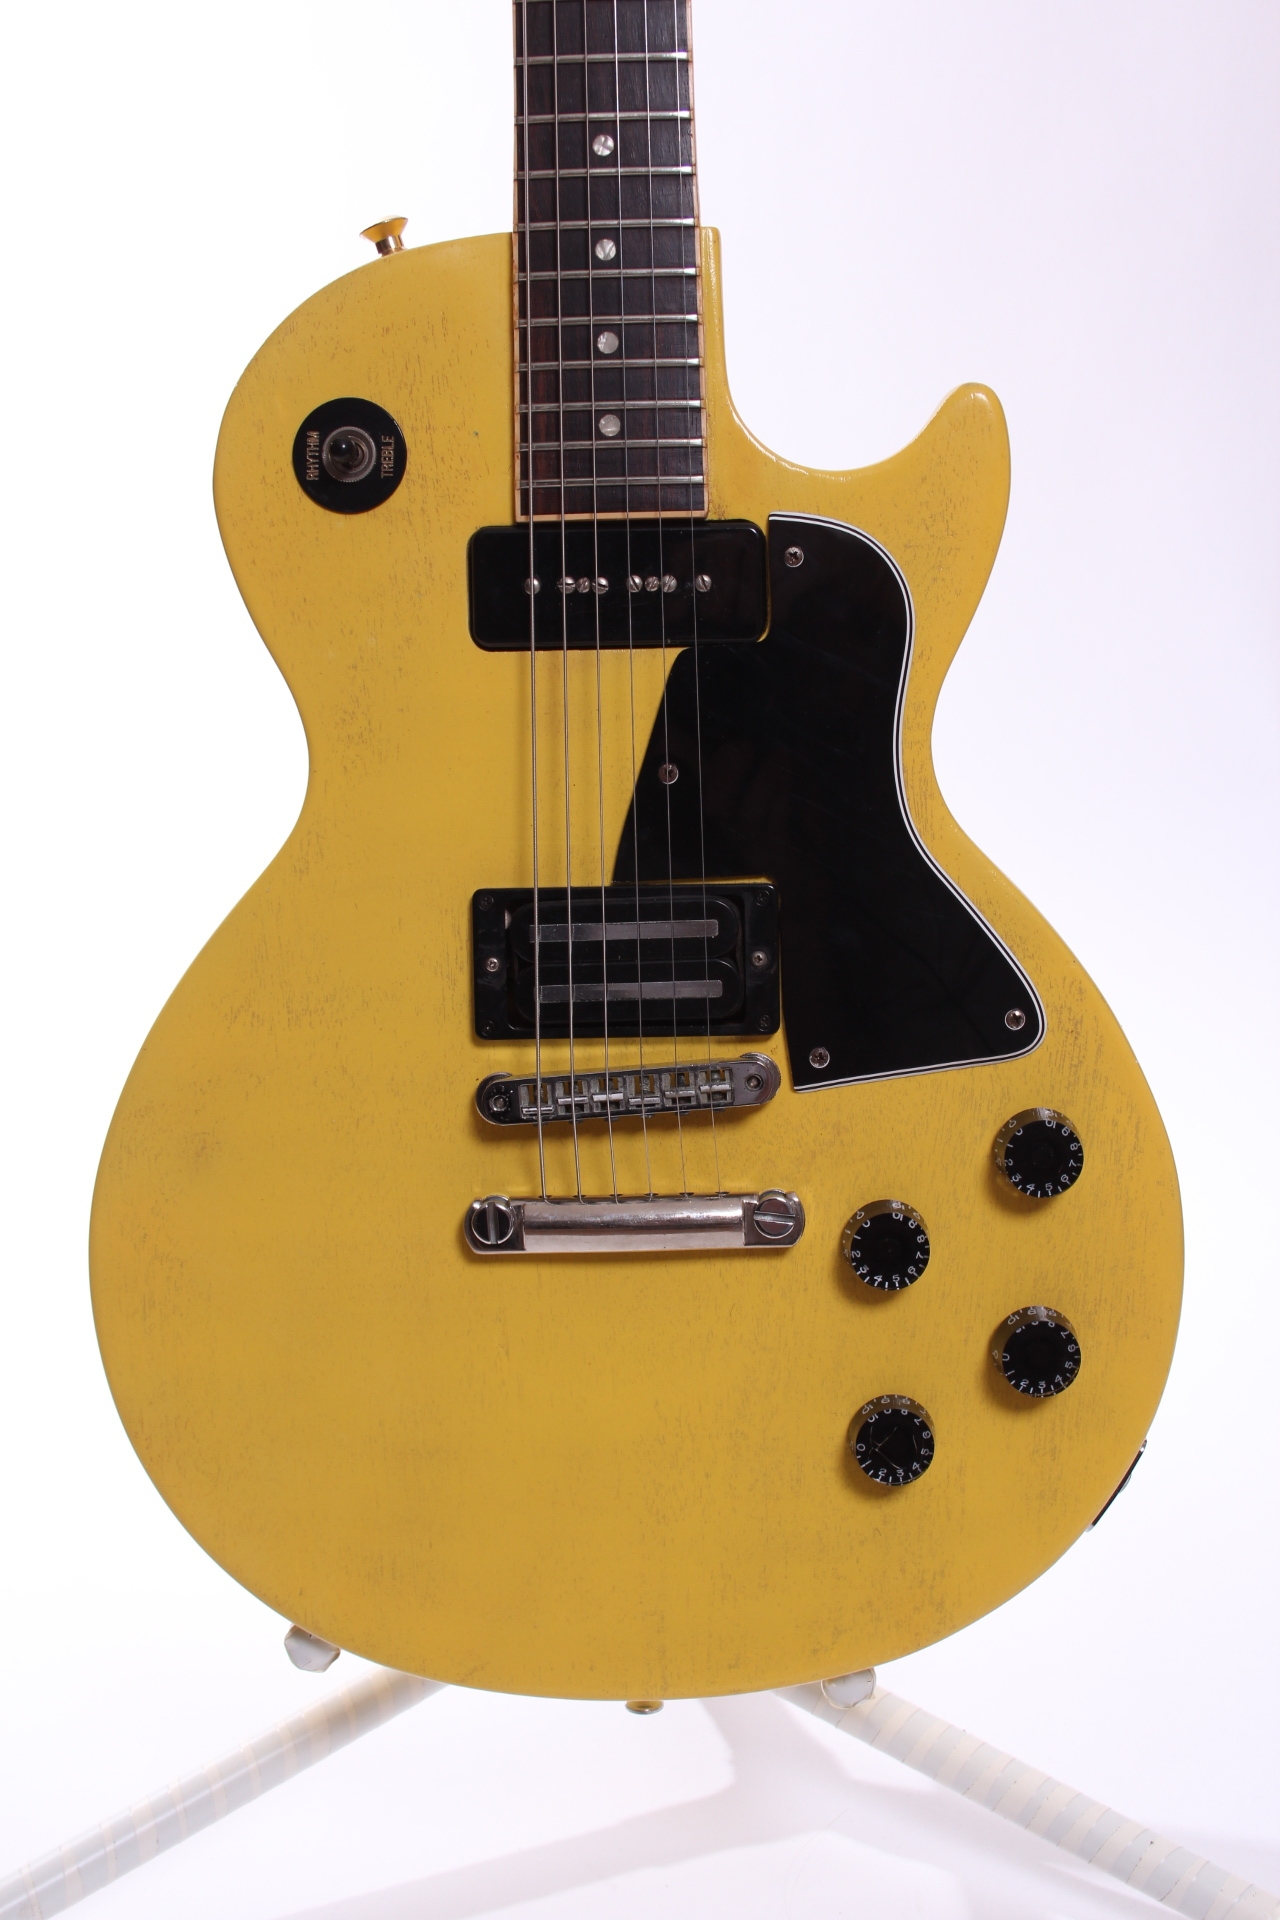 Les Paul Special Tv Yellow : gibson les paul special 1995 tv yellow guitar for sale yeahman 39 s guitars ~ Vivirlamusica.com Haus und Dekorationen